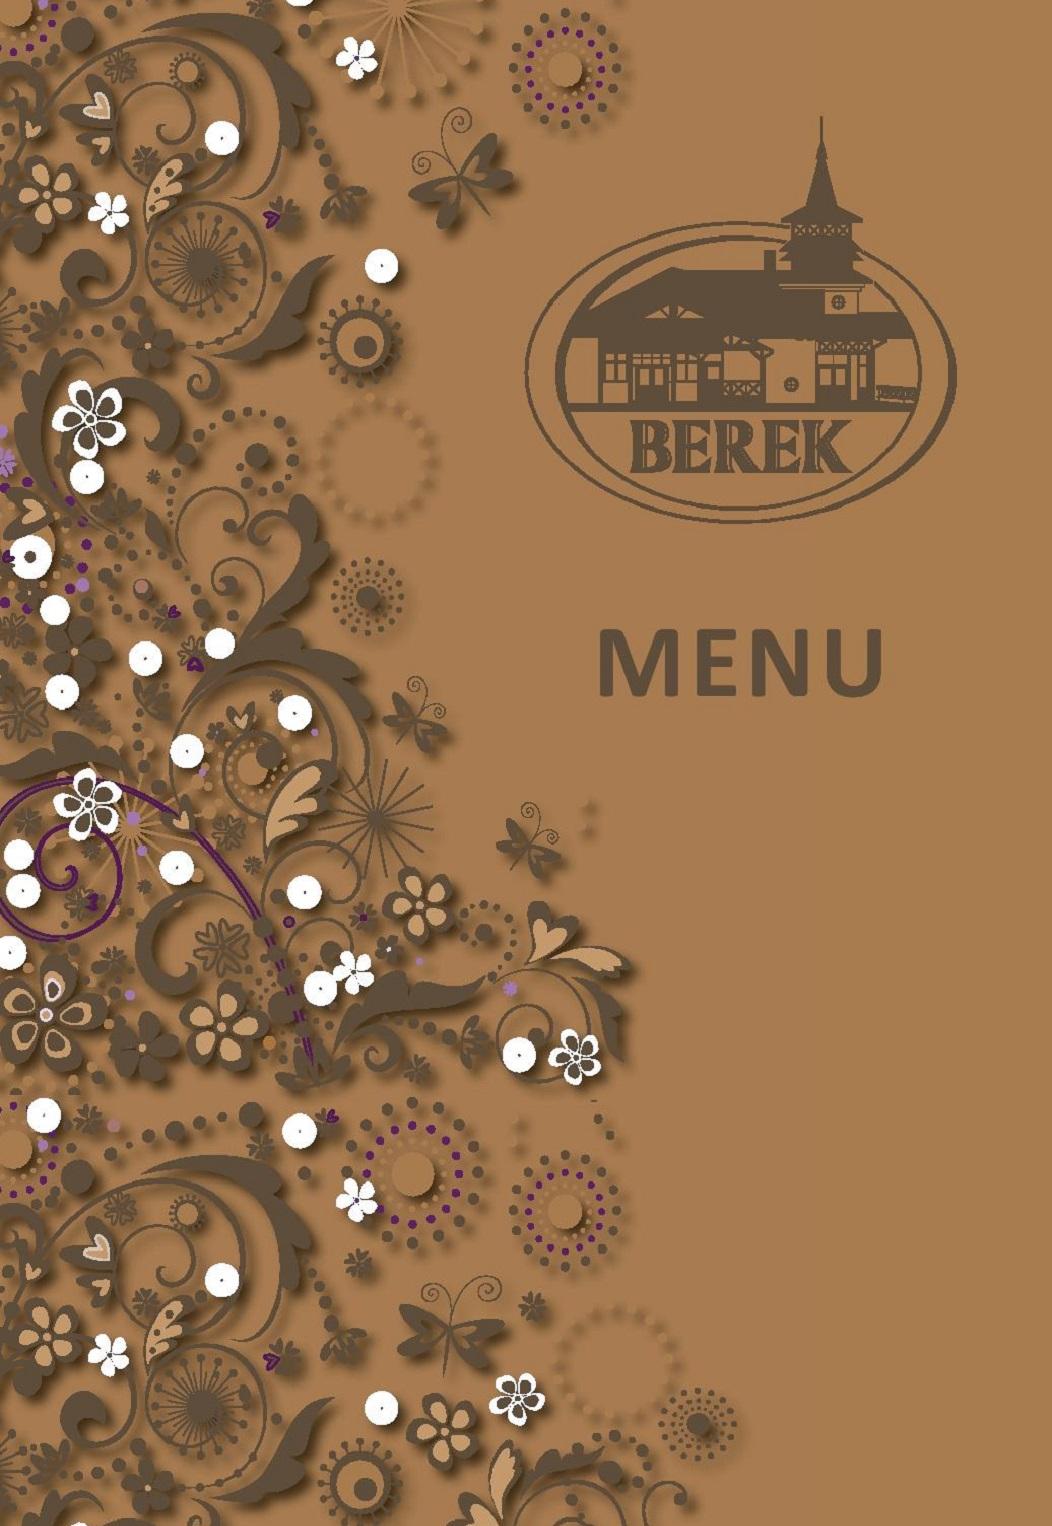 Nedelne menu restauracia Berek Nove Zamky